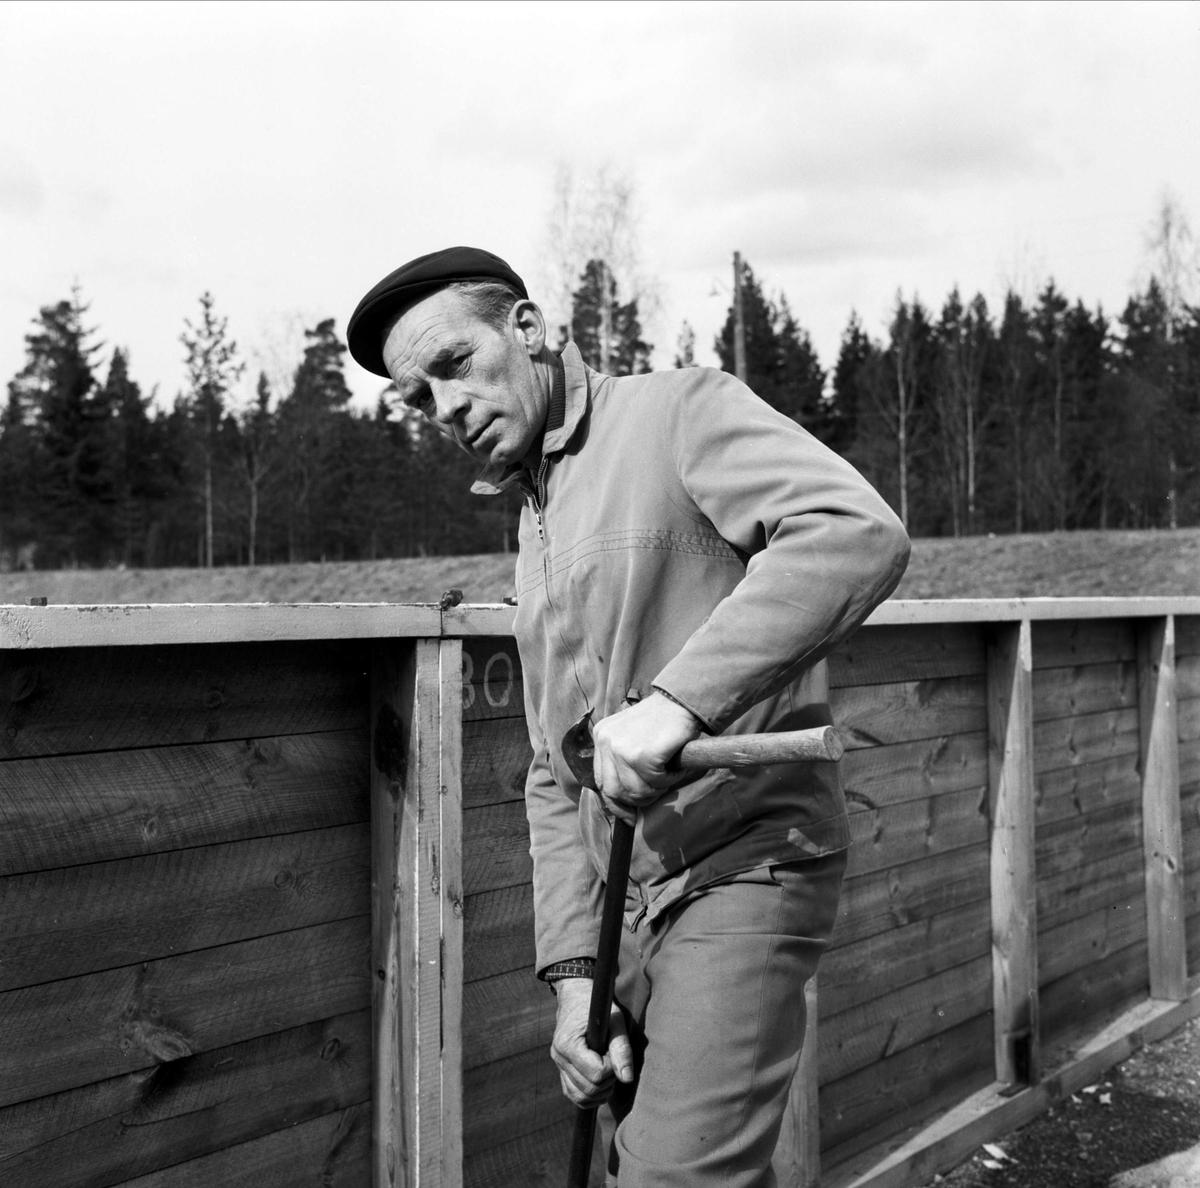 Ingvar Jansson - Vegavallens förste vaktmästare, Tierp, Uppland 1967